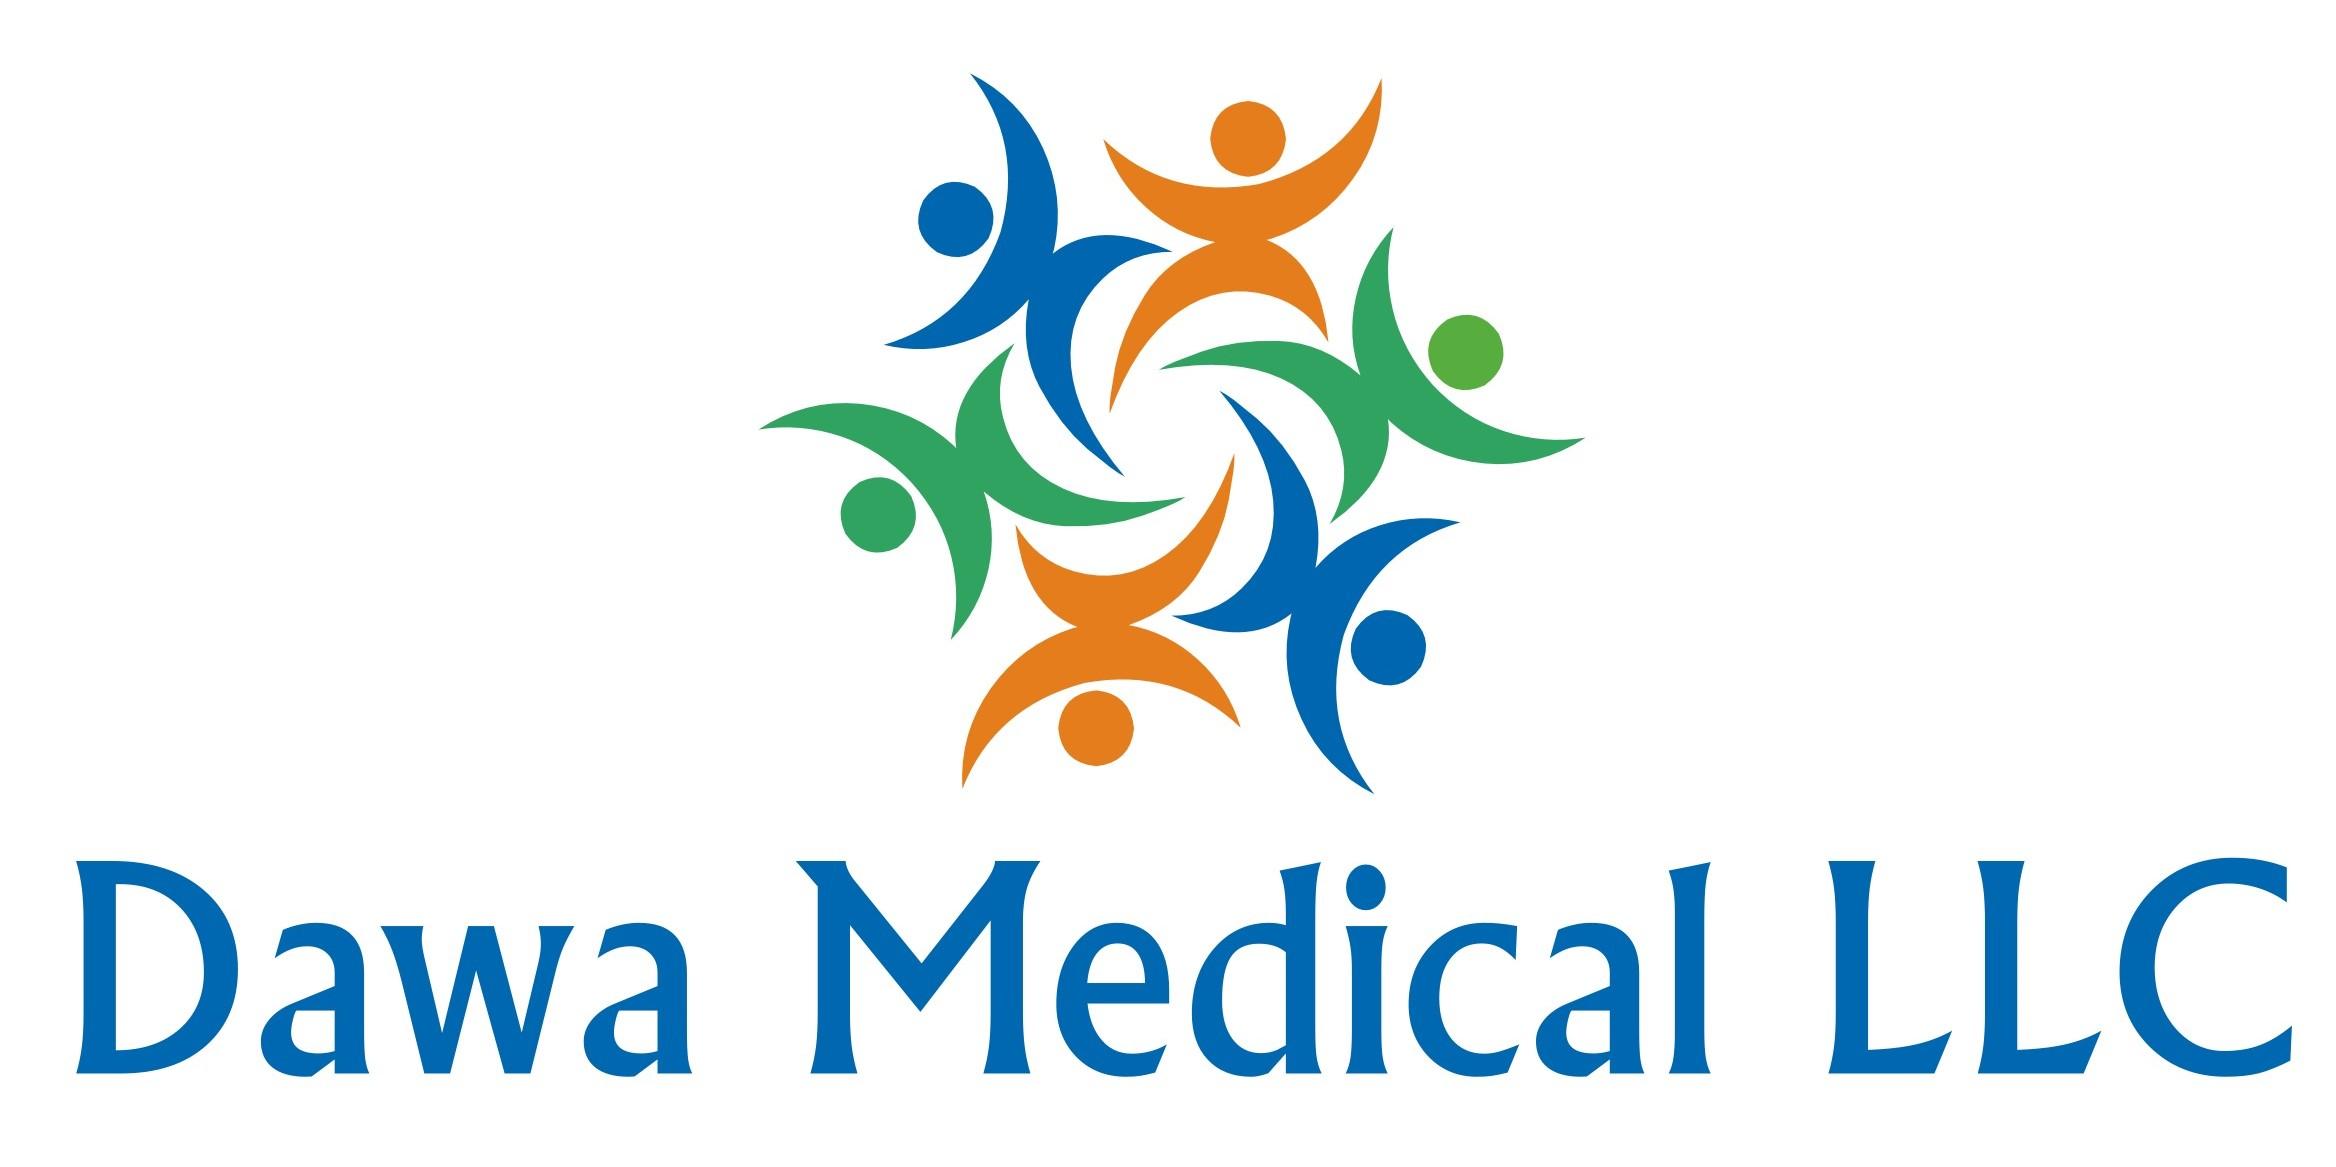 logo-dawa-medical-llc